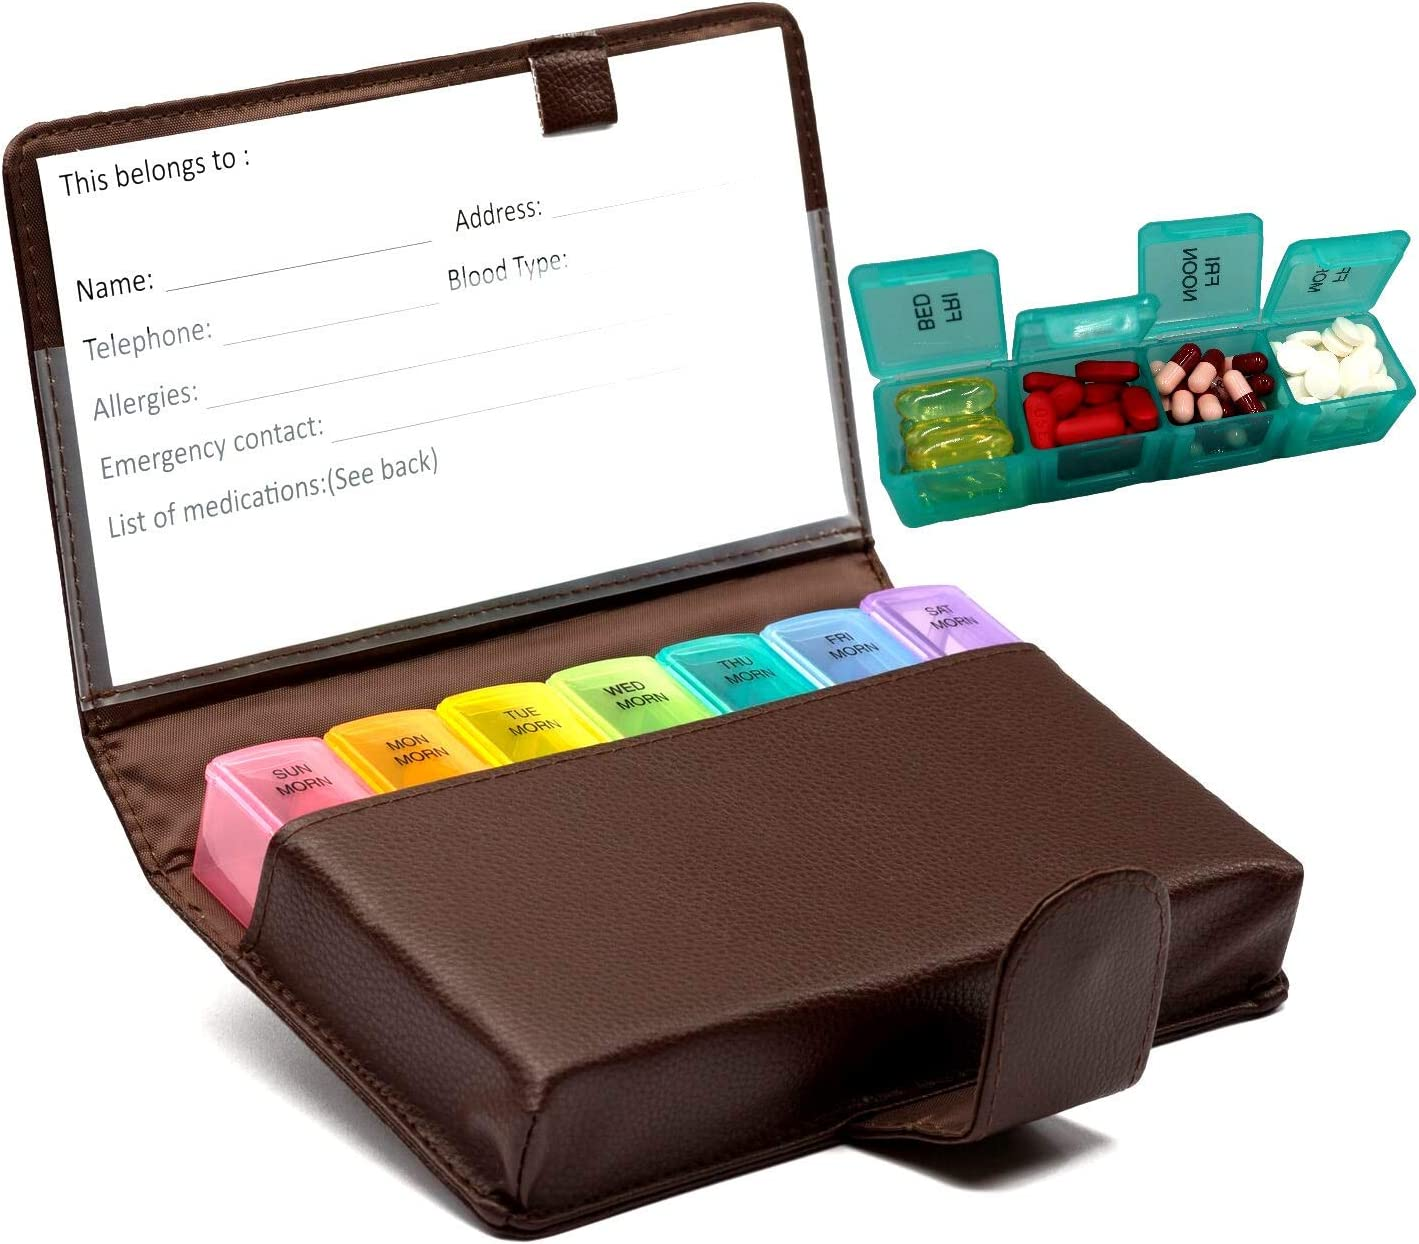 Car Interior Coin Pocket Cases Holder Plastics Storage Box Dispenser Organize y